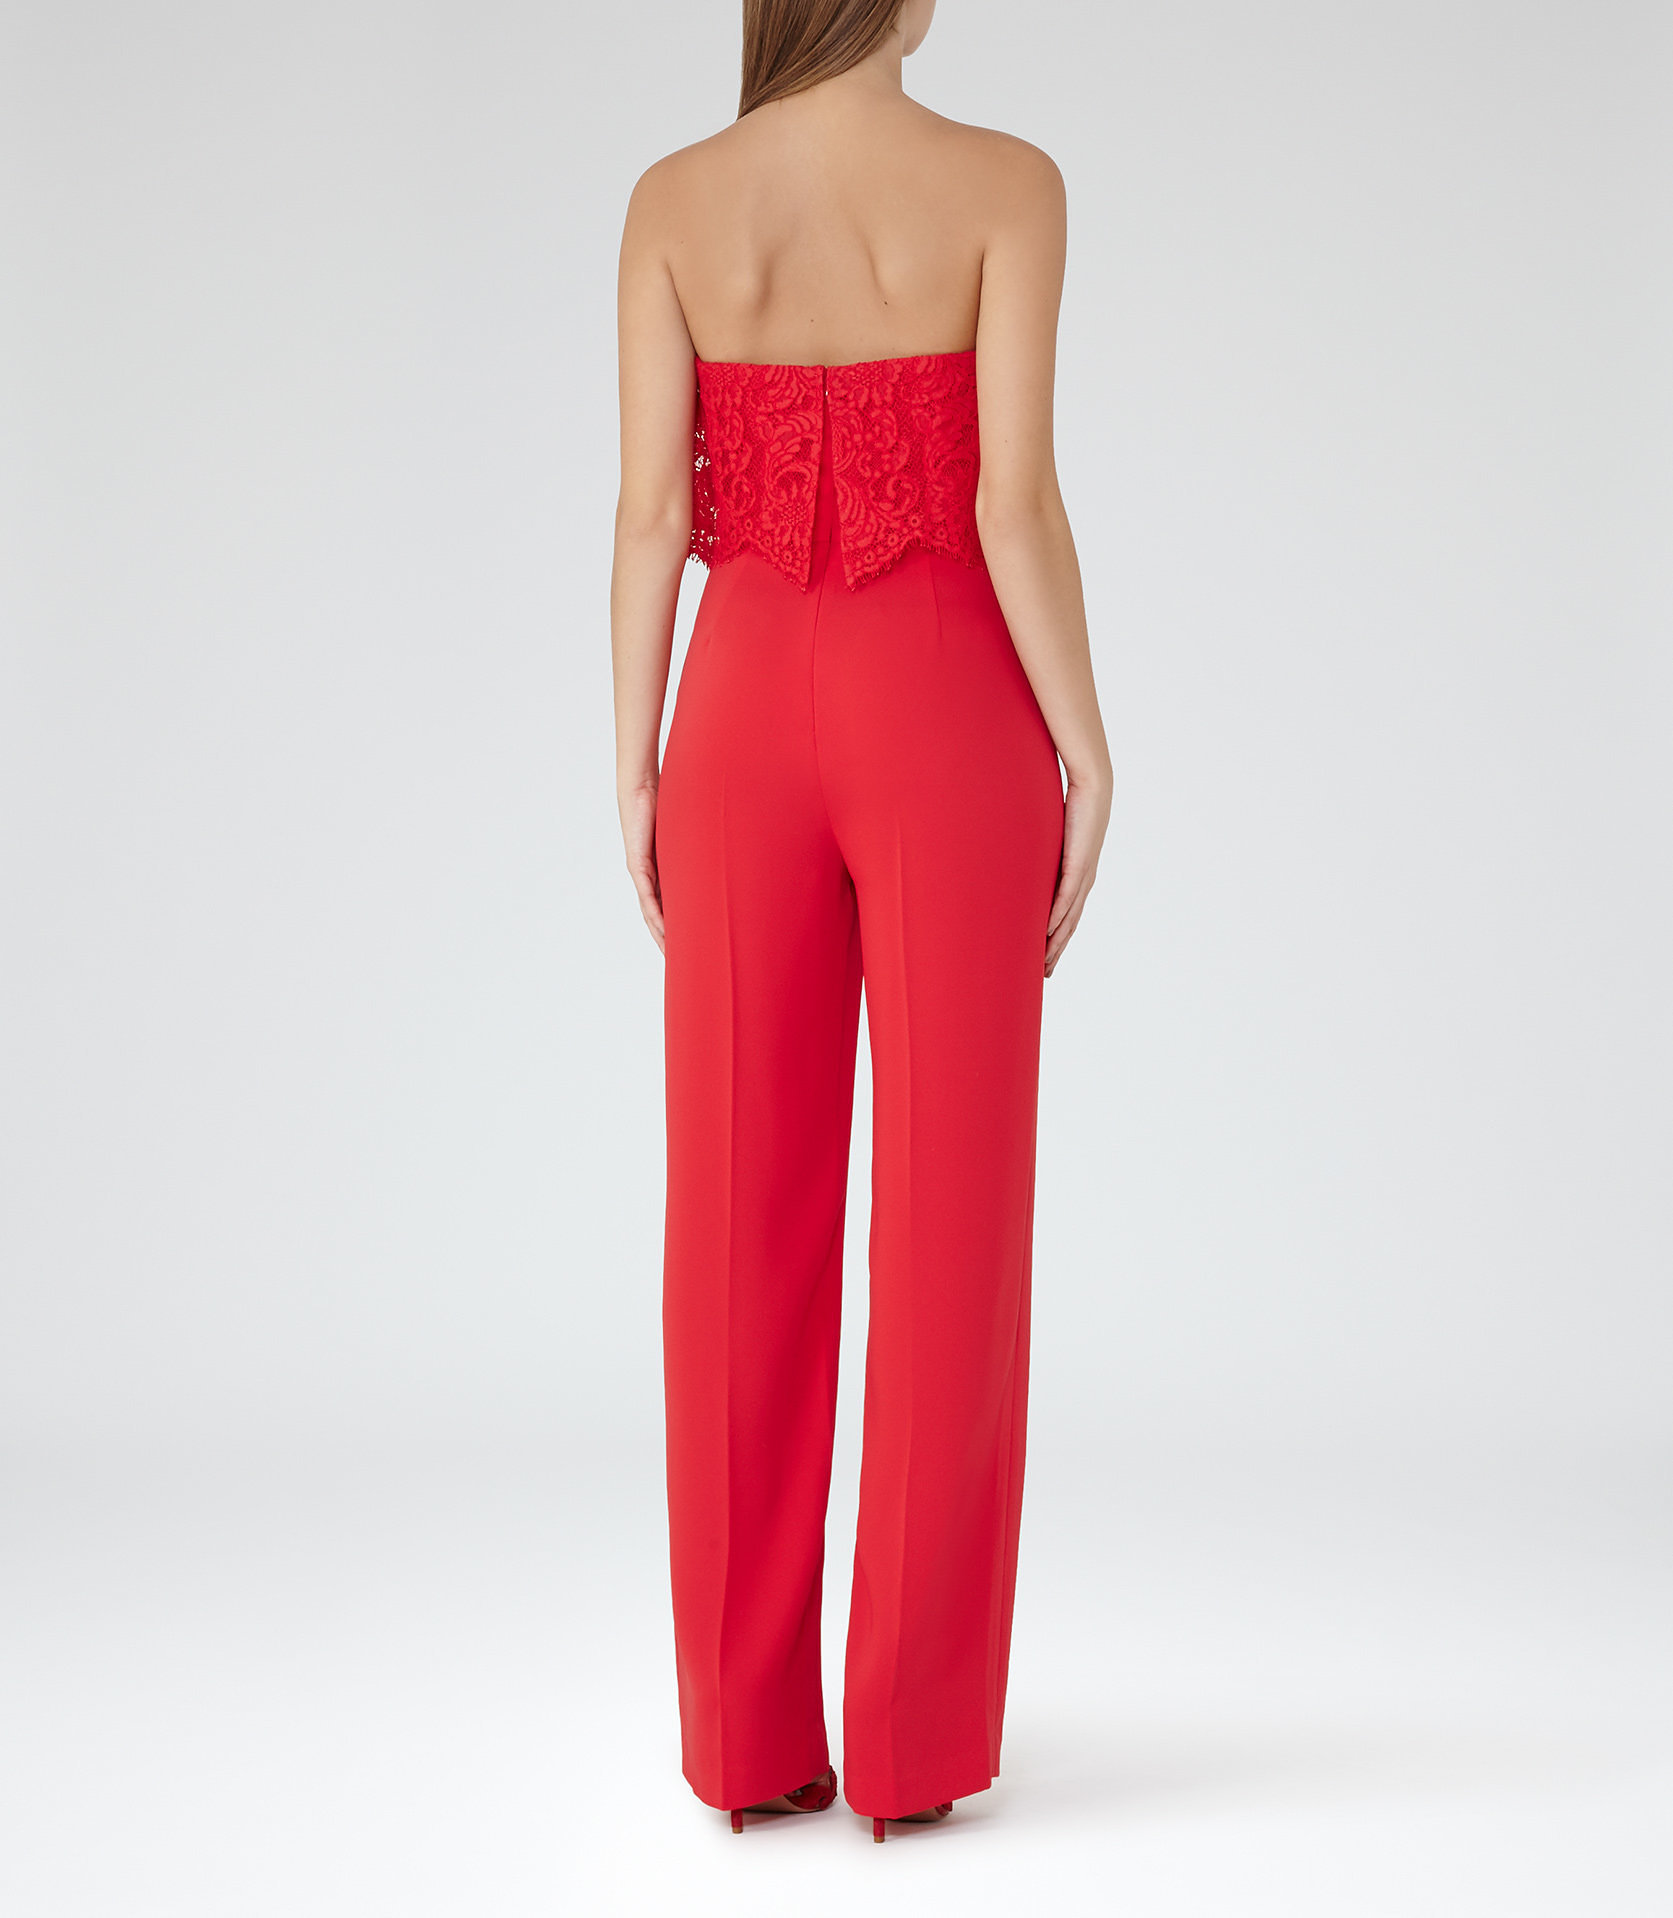 Natalie red jumpsuit 4